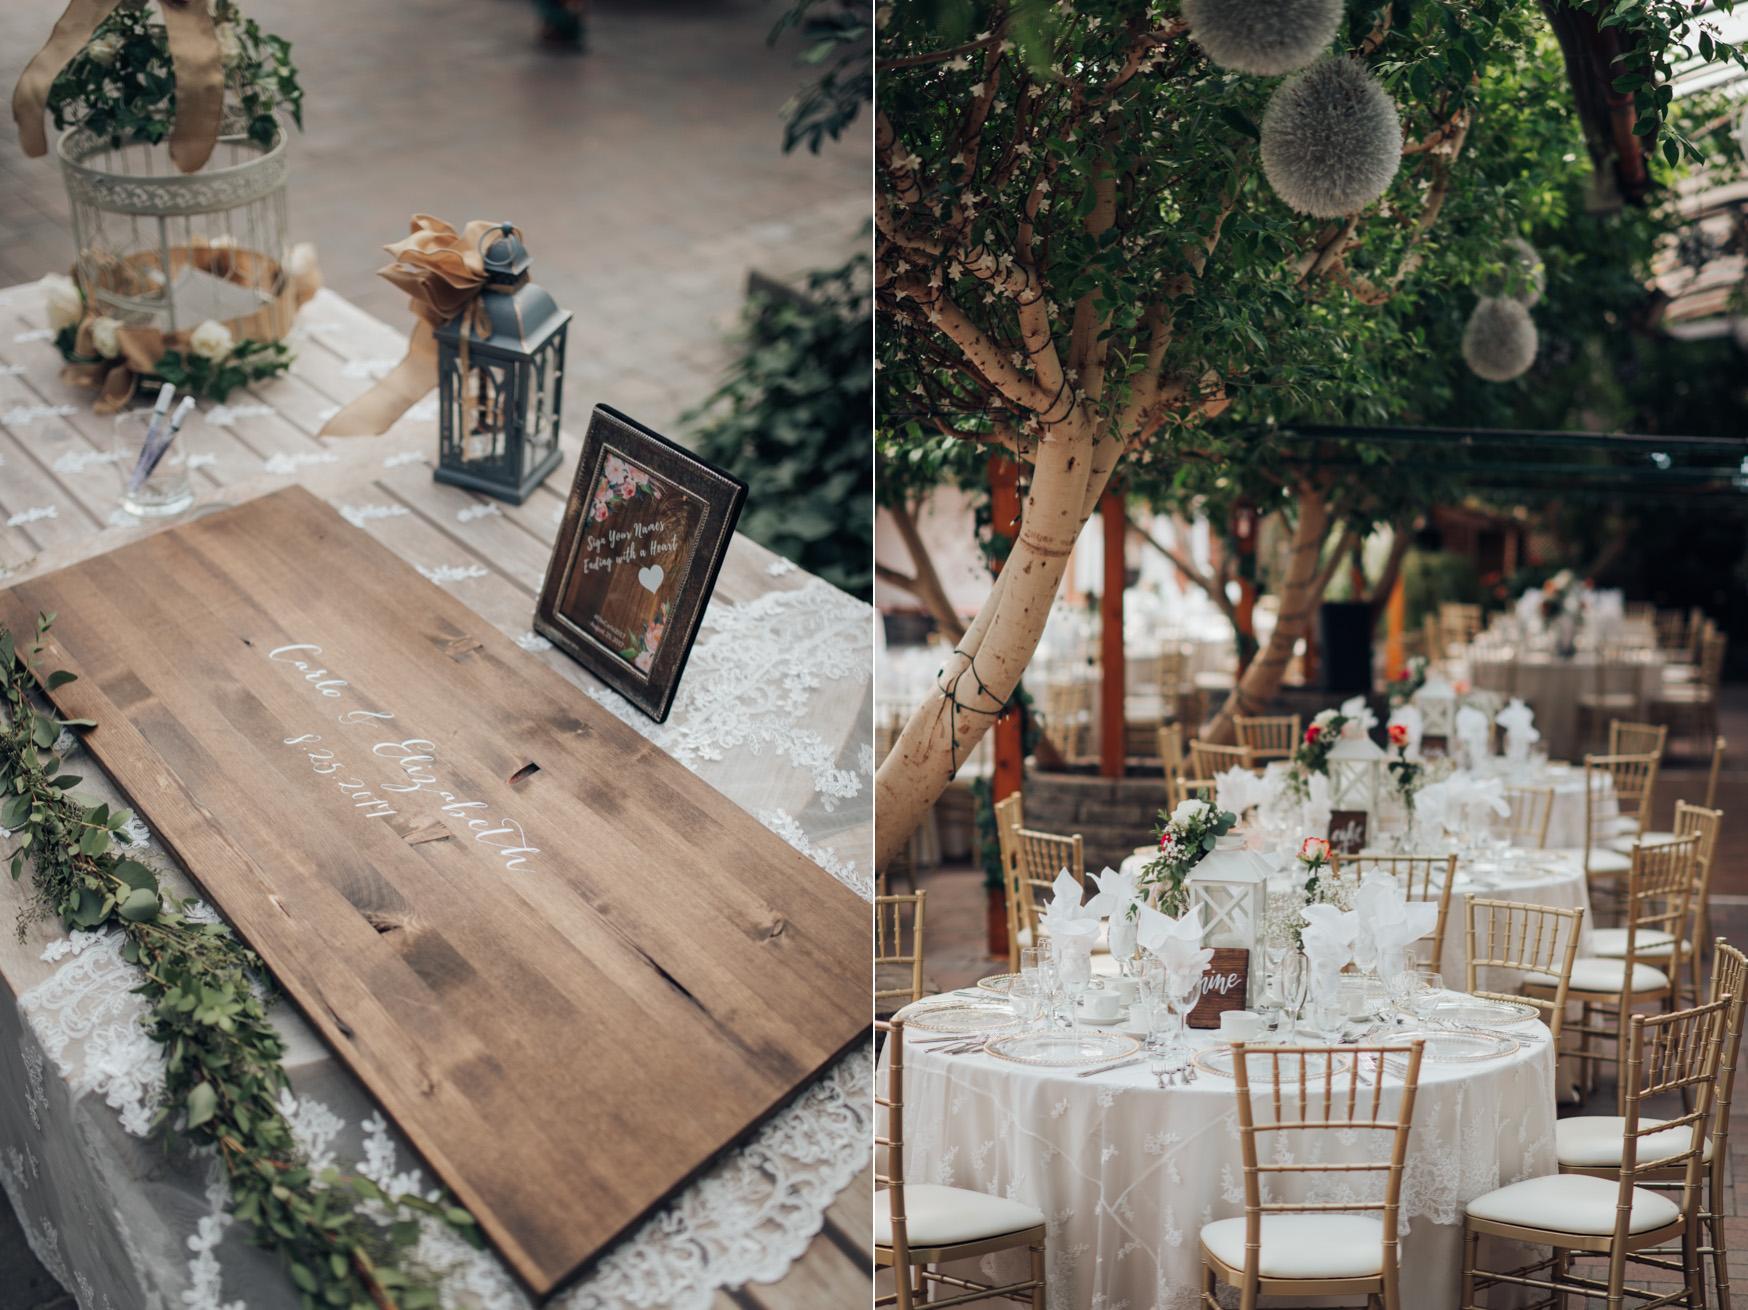 GTA Madsen's Greenhouse Wedding Table setting details